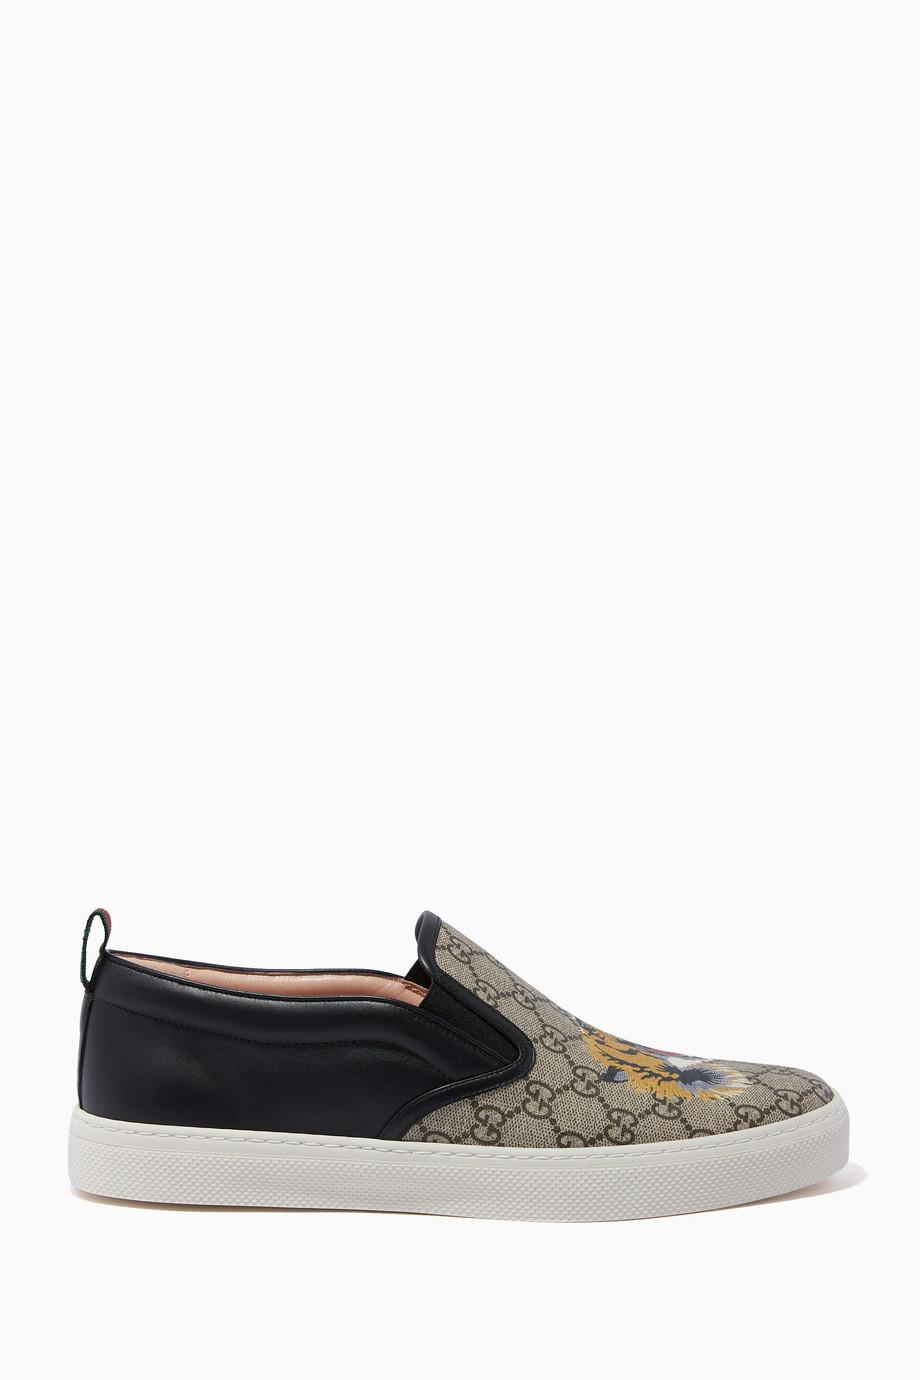 d238c98da1778 Shop Gucci Black Beige   Black GG Supreme Tiger Slip-On Sneakers for ...